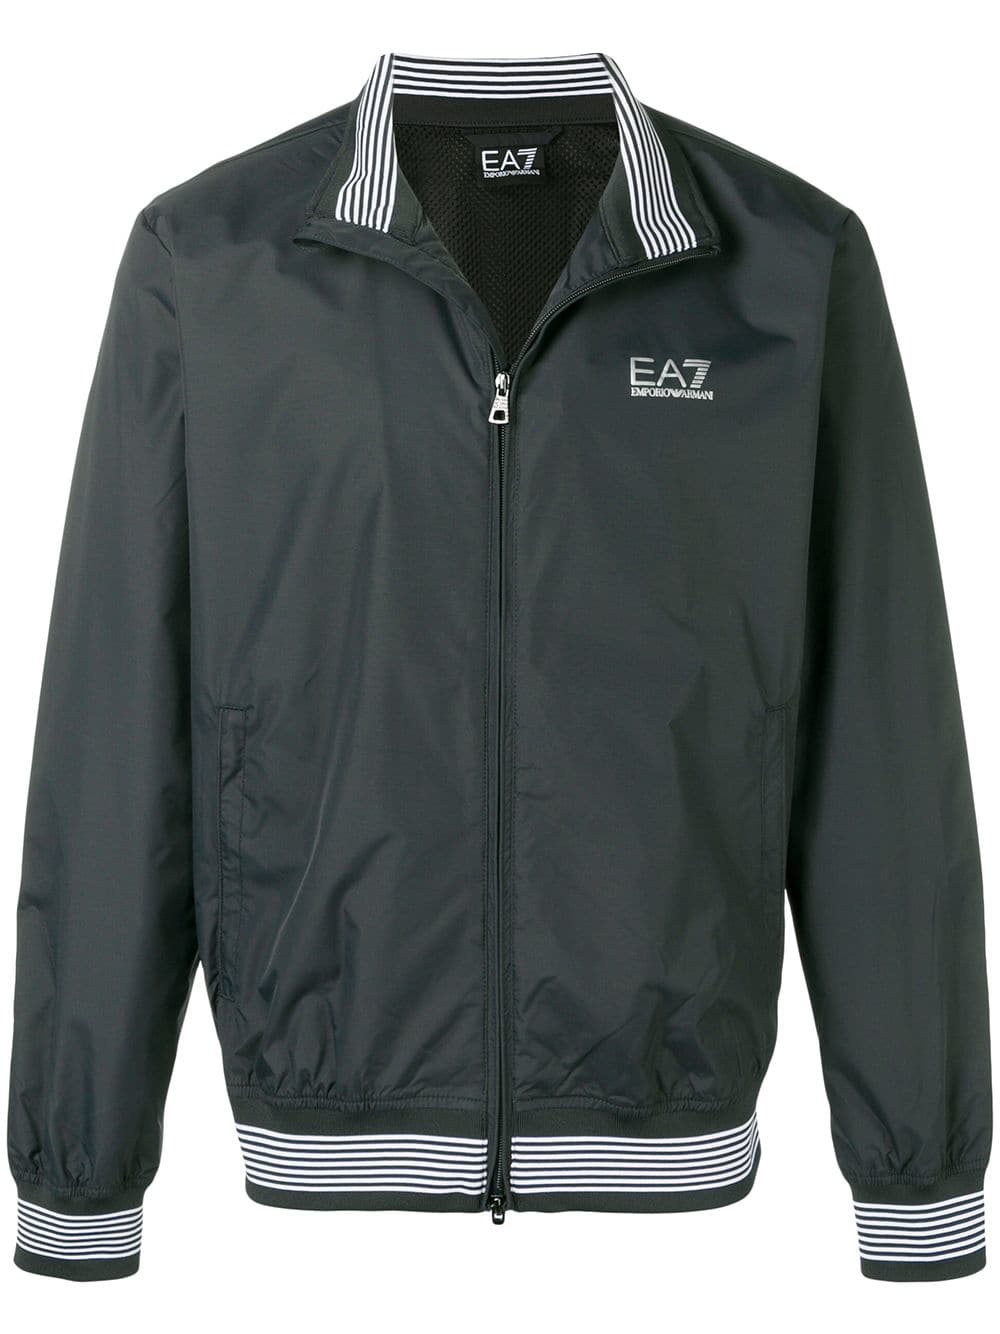 8e93b40a8d2eb Ea7 Emporio Armani Striped Trim Track Jacket - Blue | ModeSens